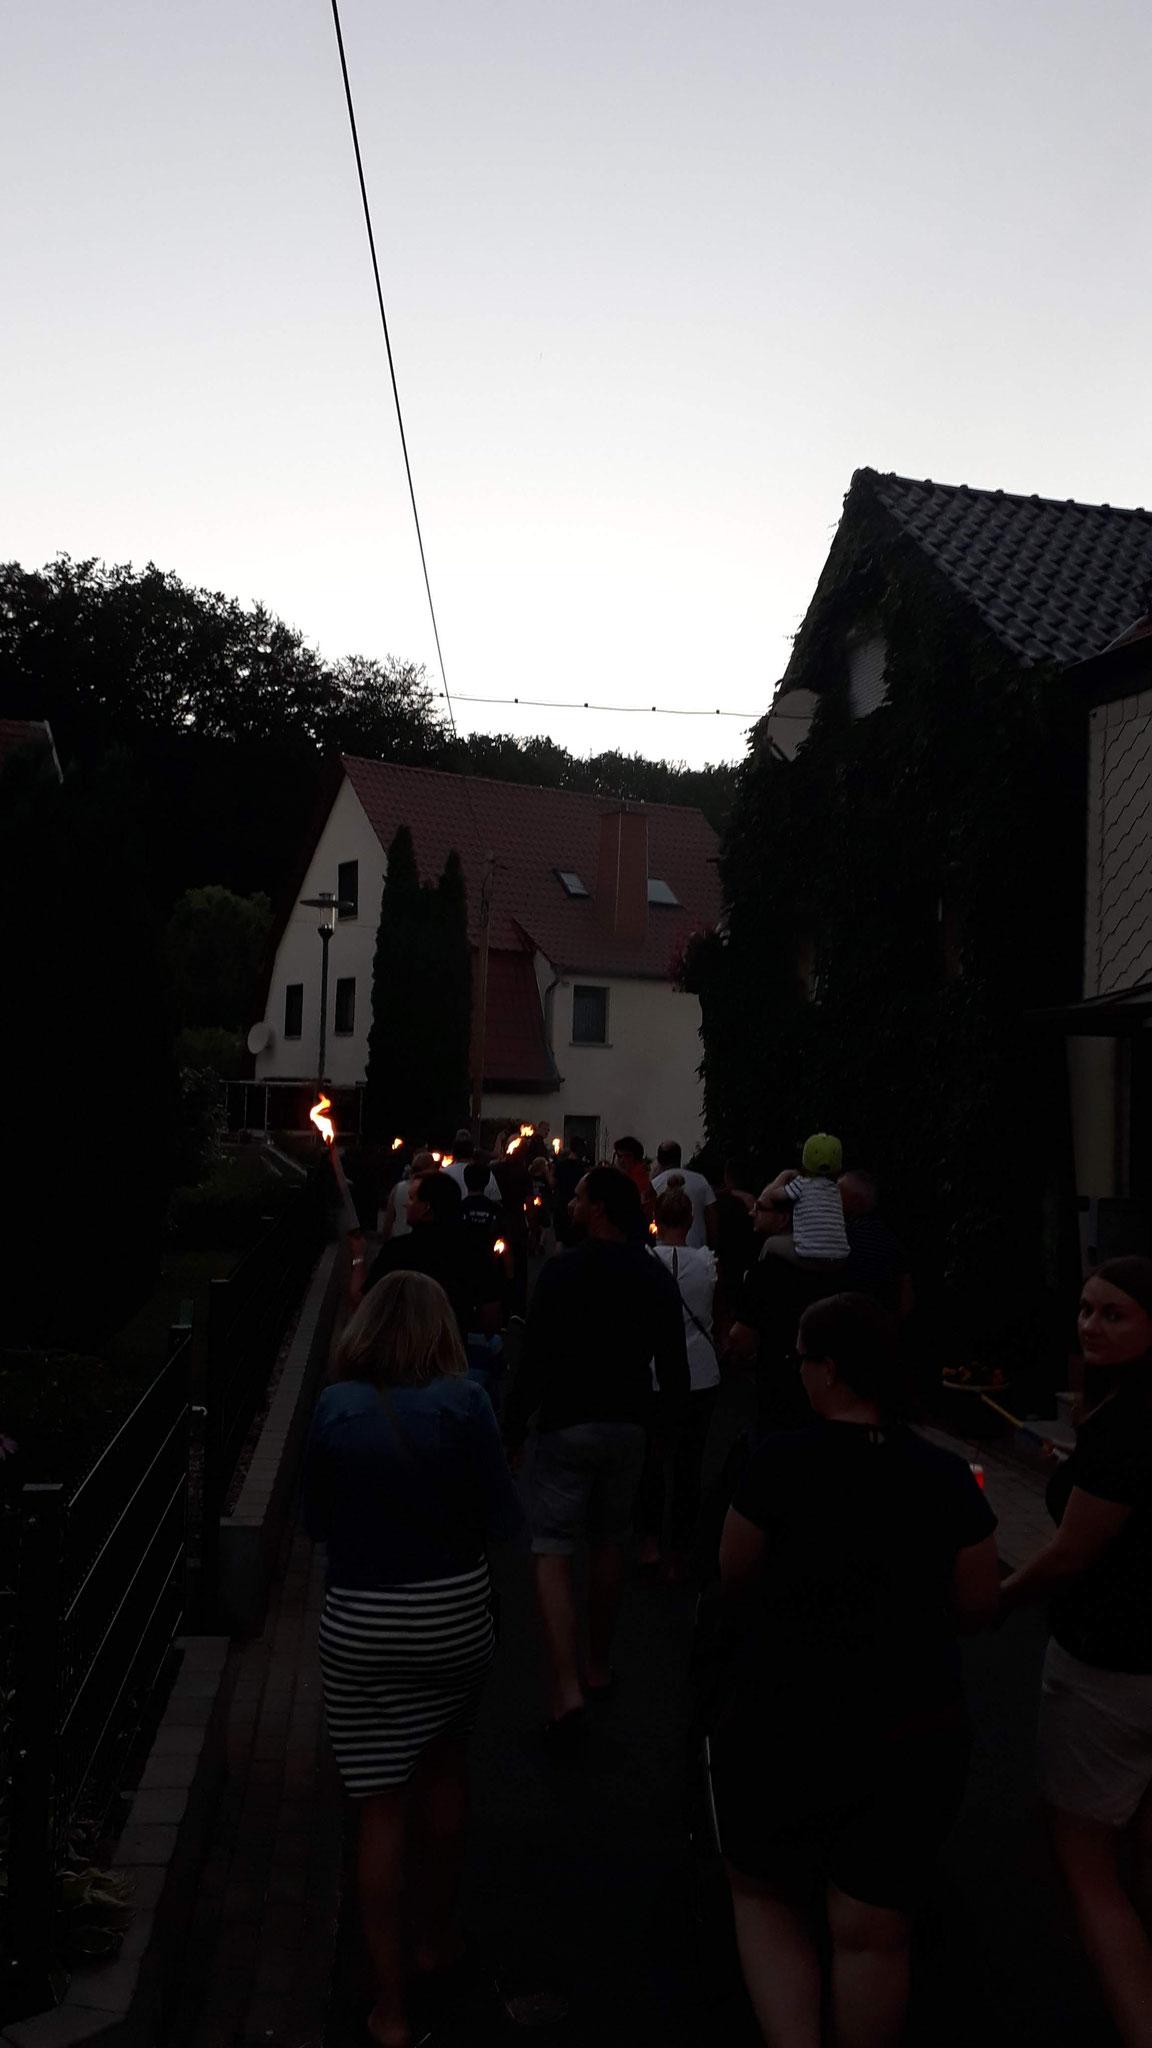 29.06.2019 Feuerwehrfest - Fackelzug